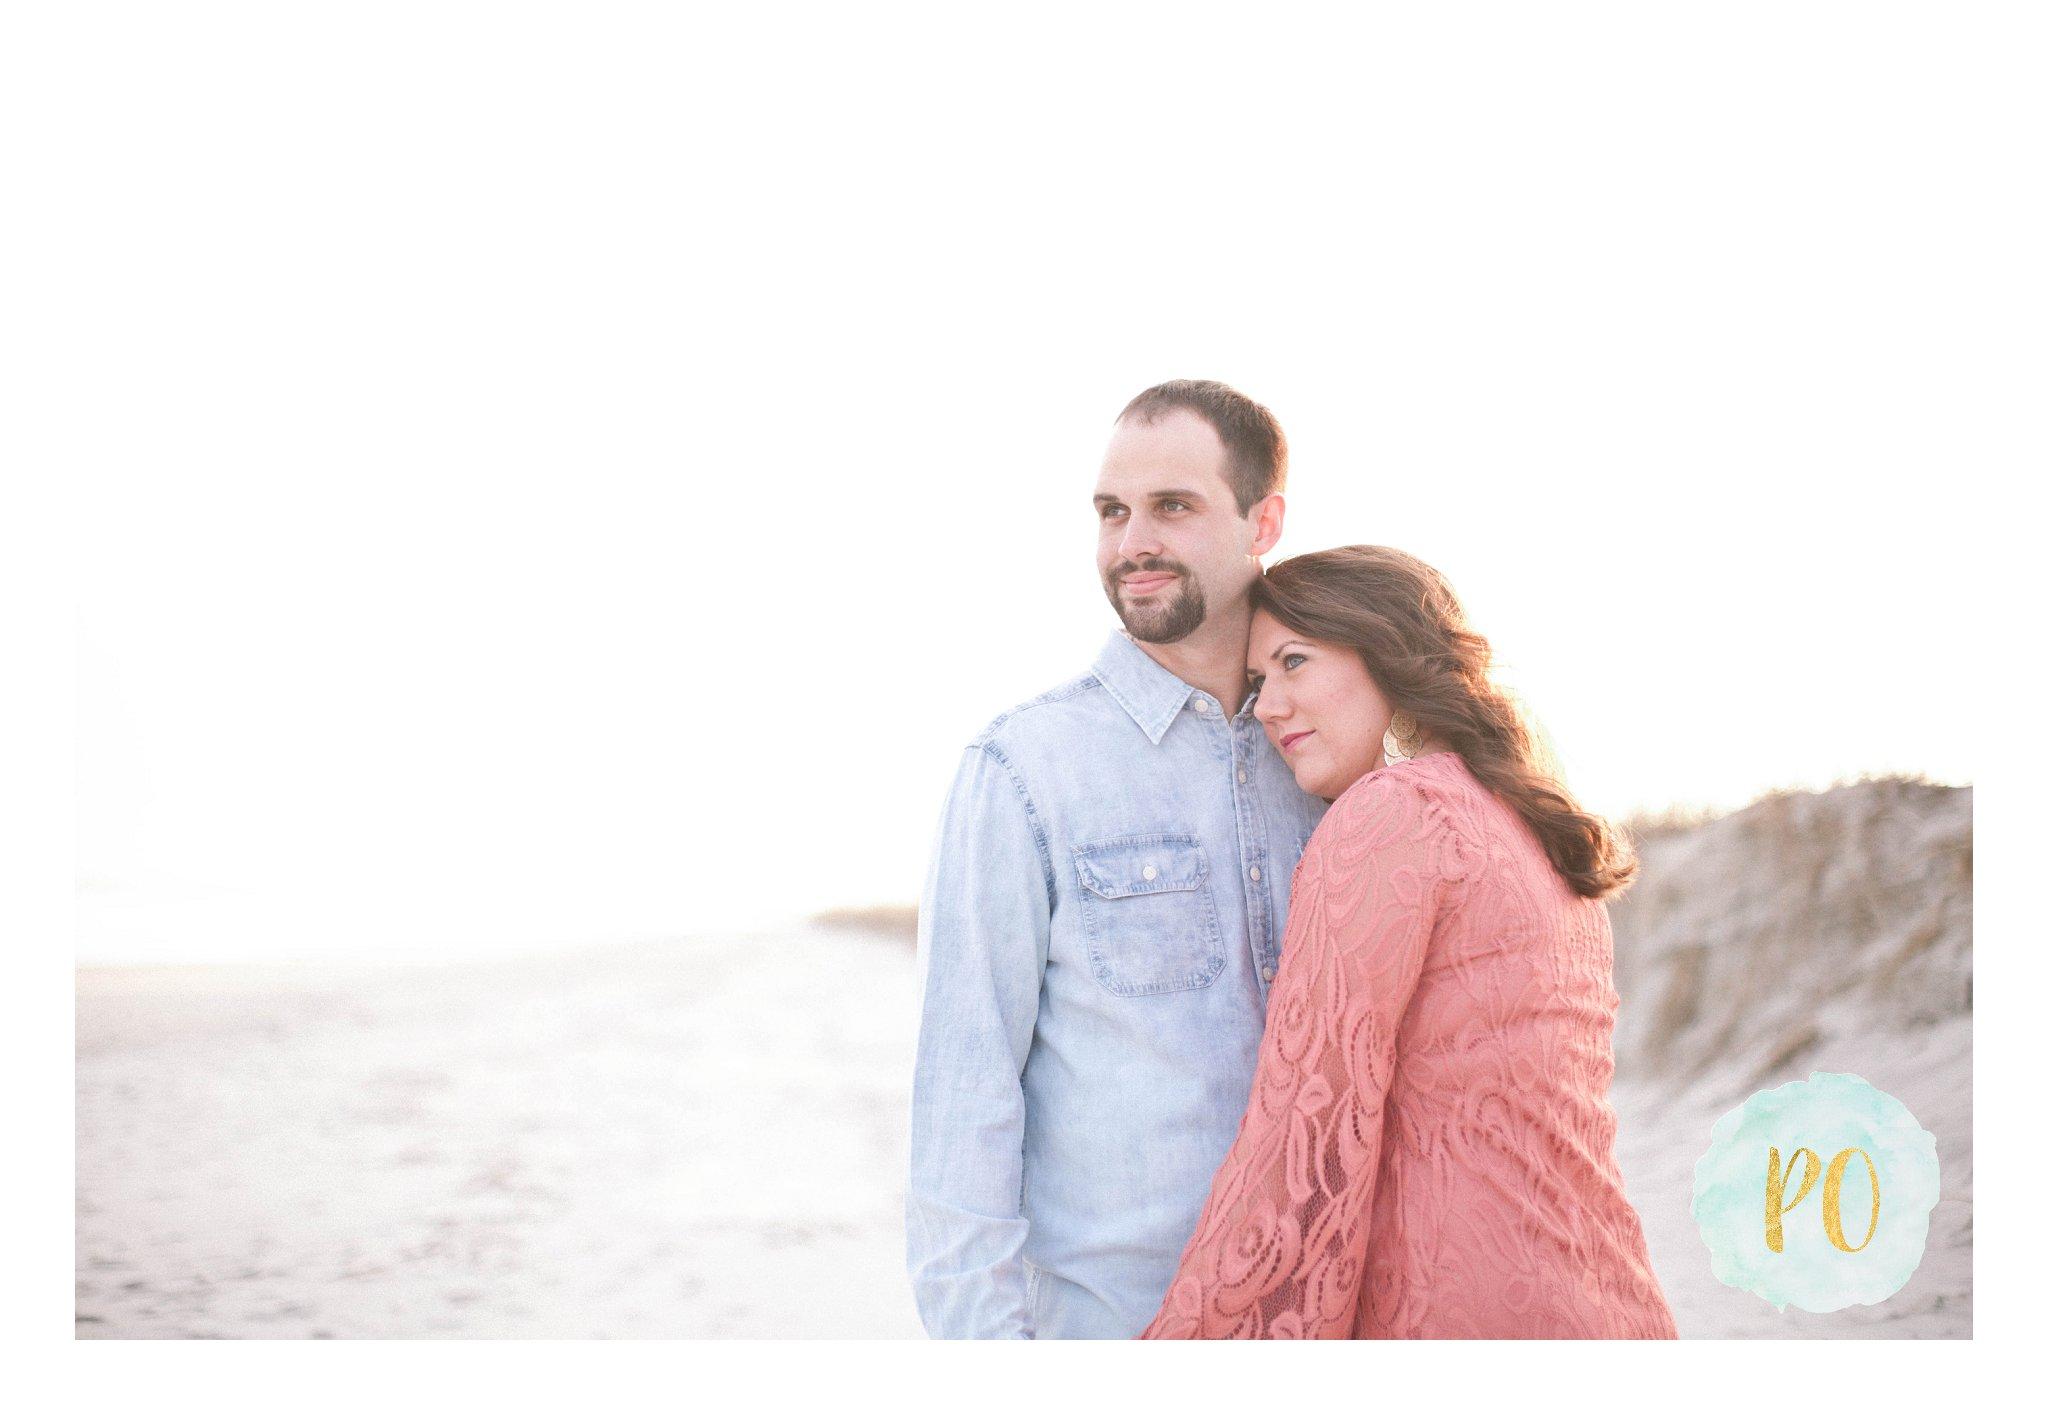 huntington-beach-engagement-murrells-inlet-sc-photos_0051.jpg